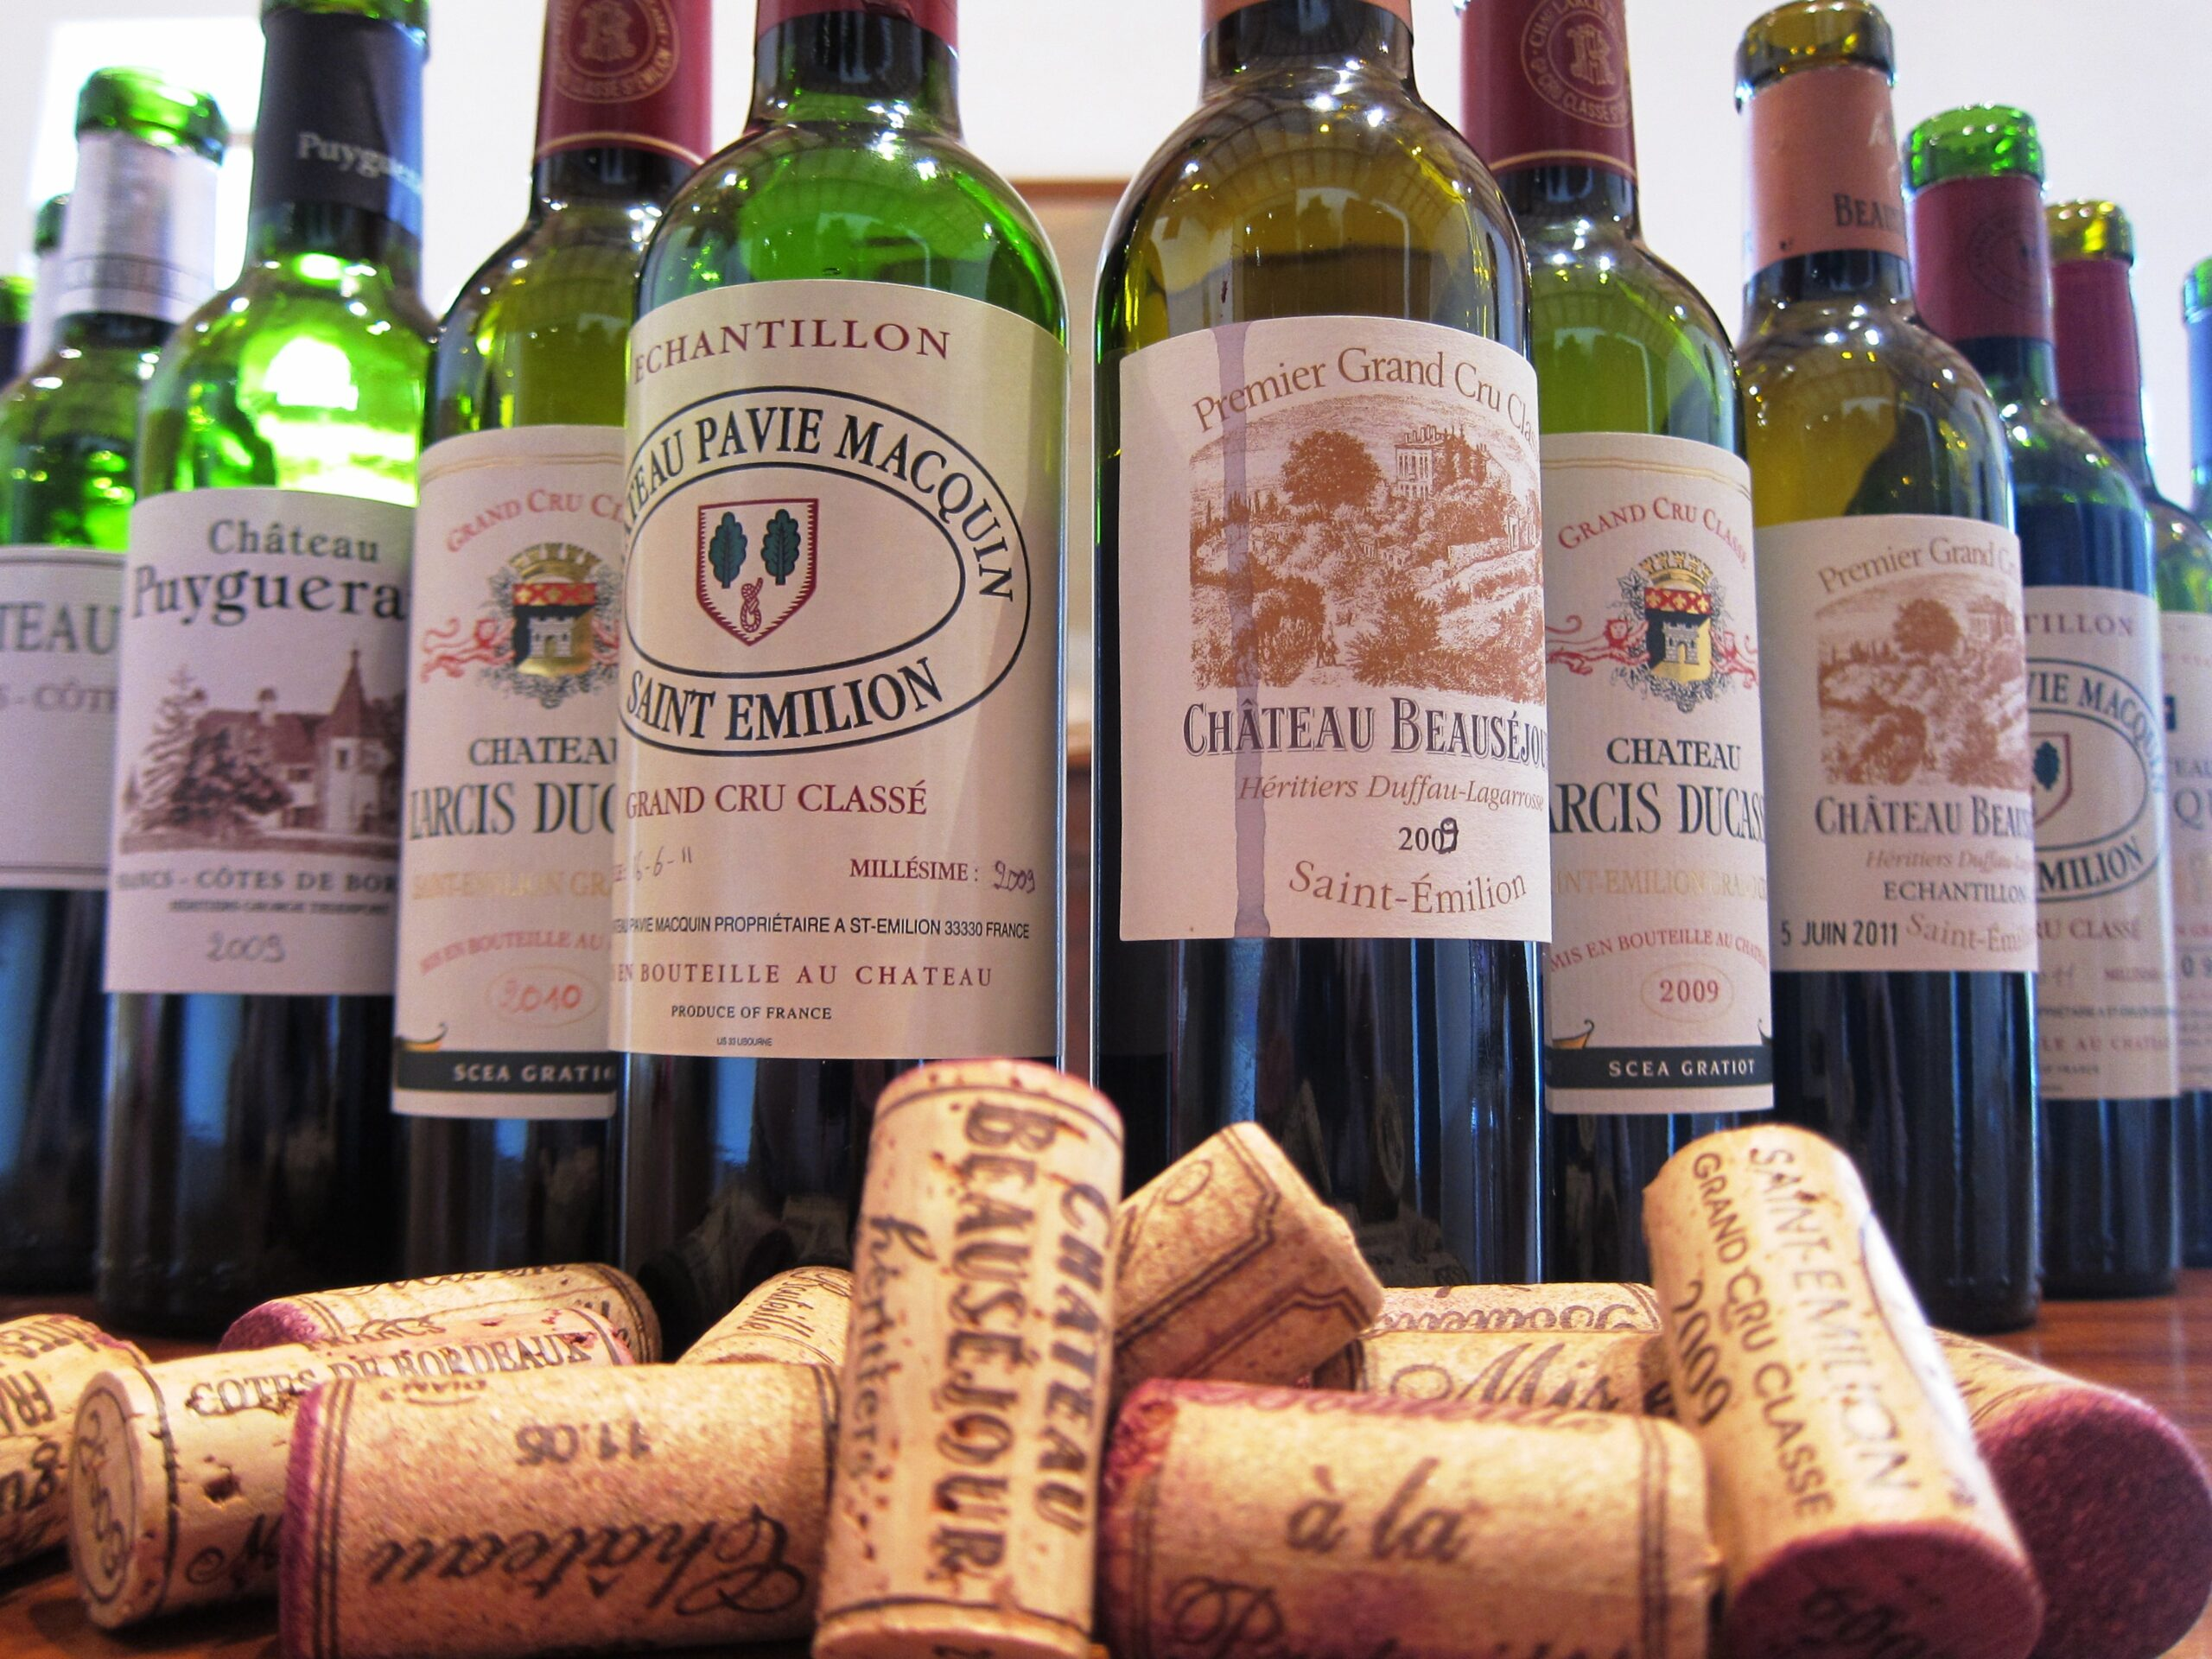 2009 Beausejour Duffau, Pavie Macquin, Larcis Ducasse Tasted